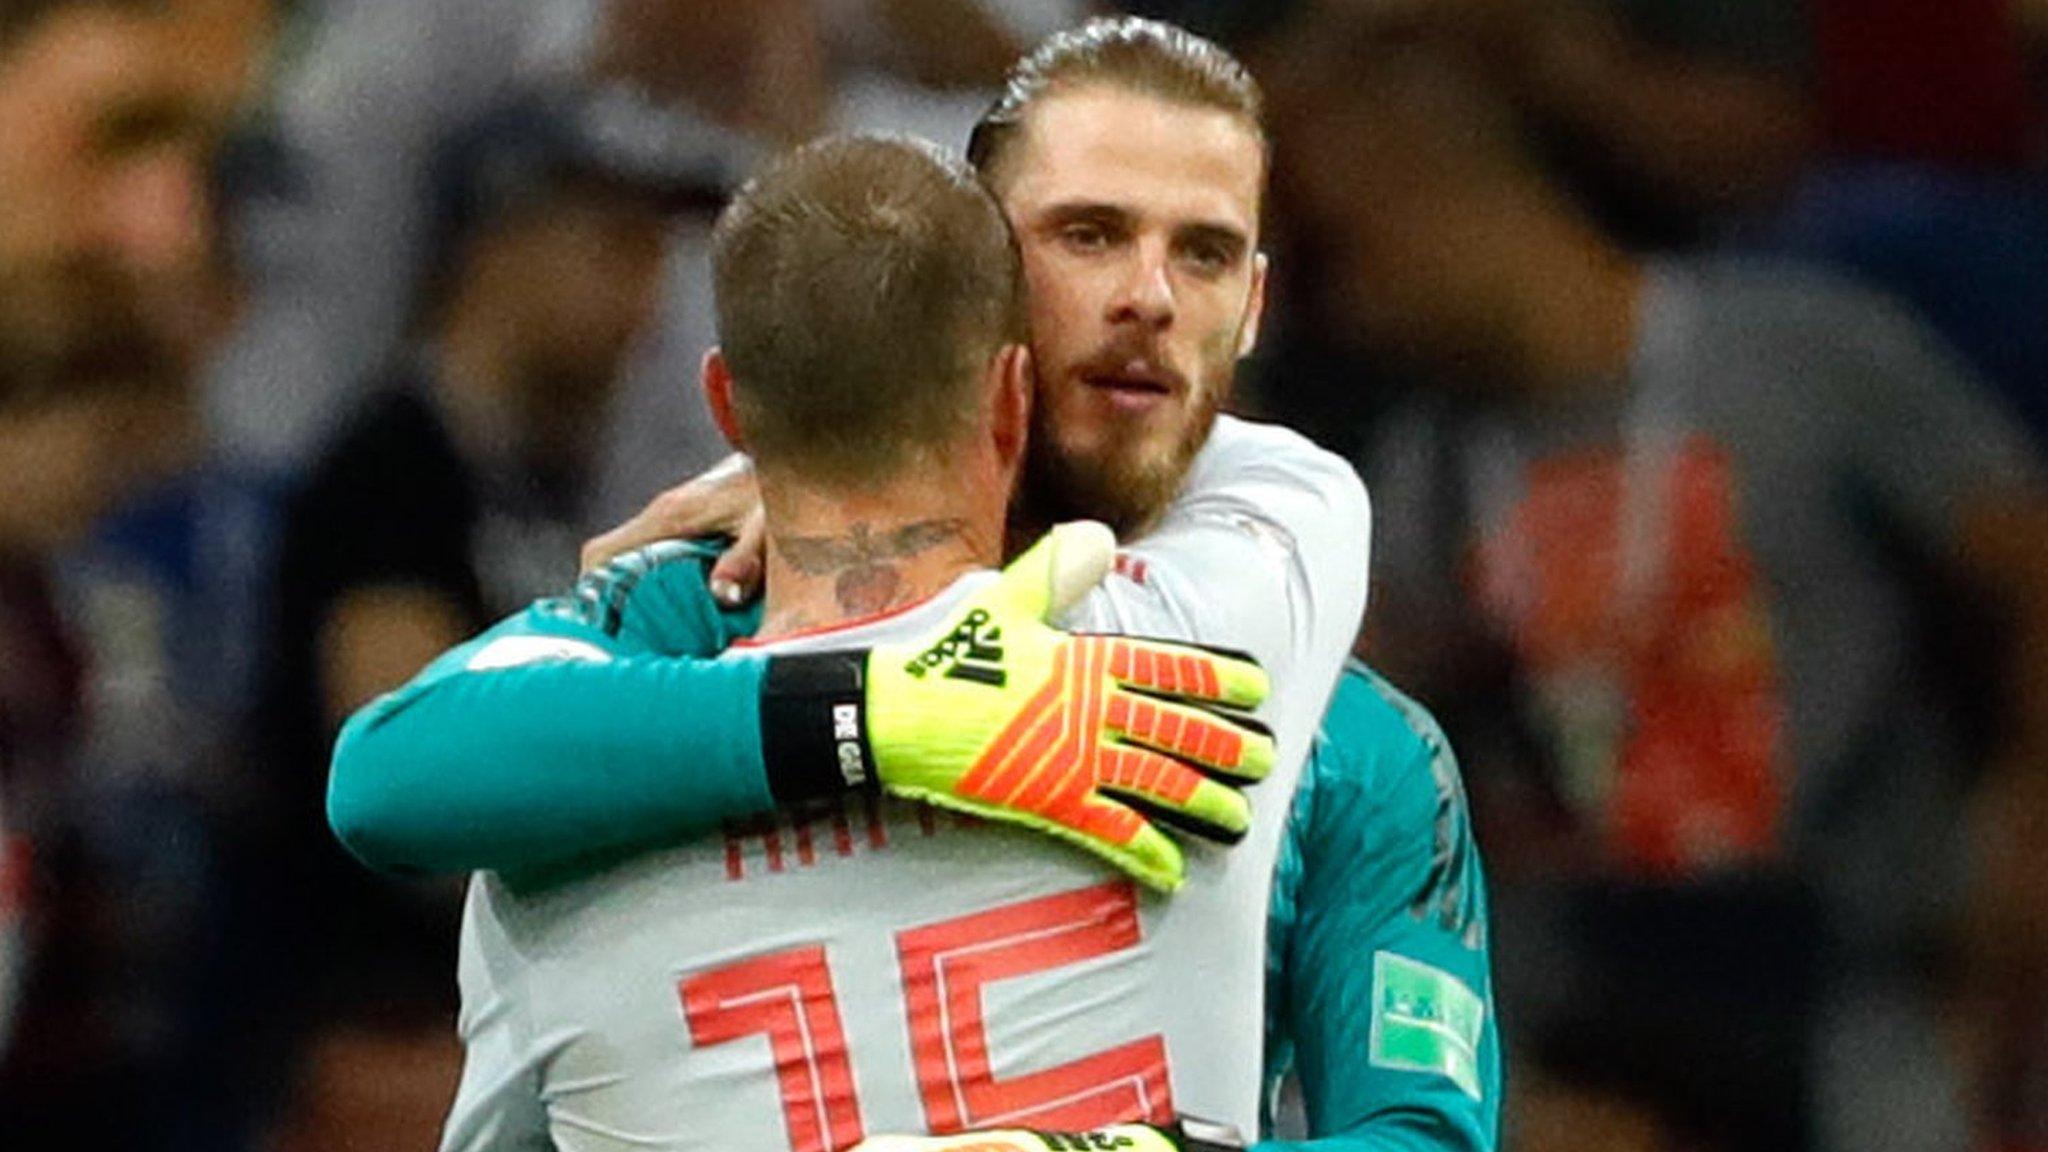 World Cup 2018: Spain players 'don't doubt' David de Gea, says Fernando Hierro